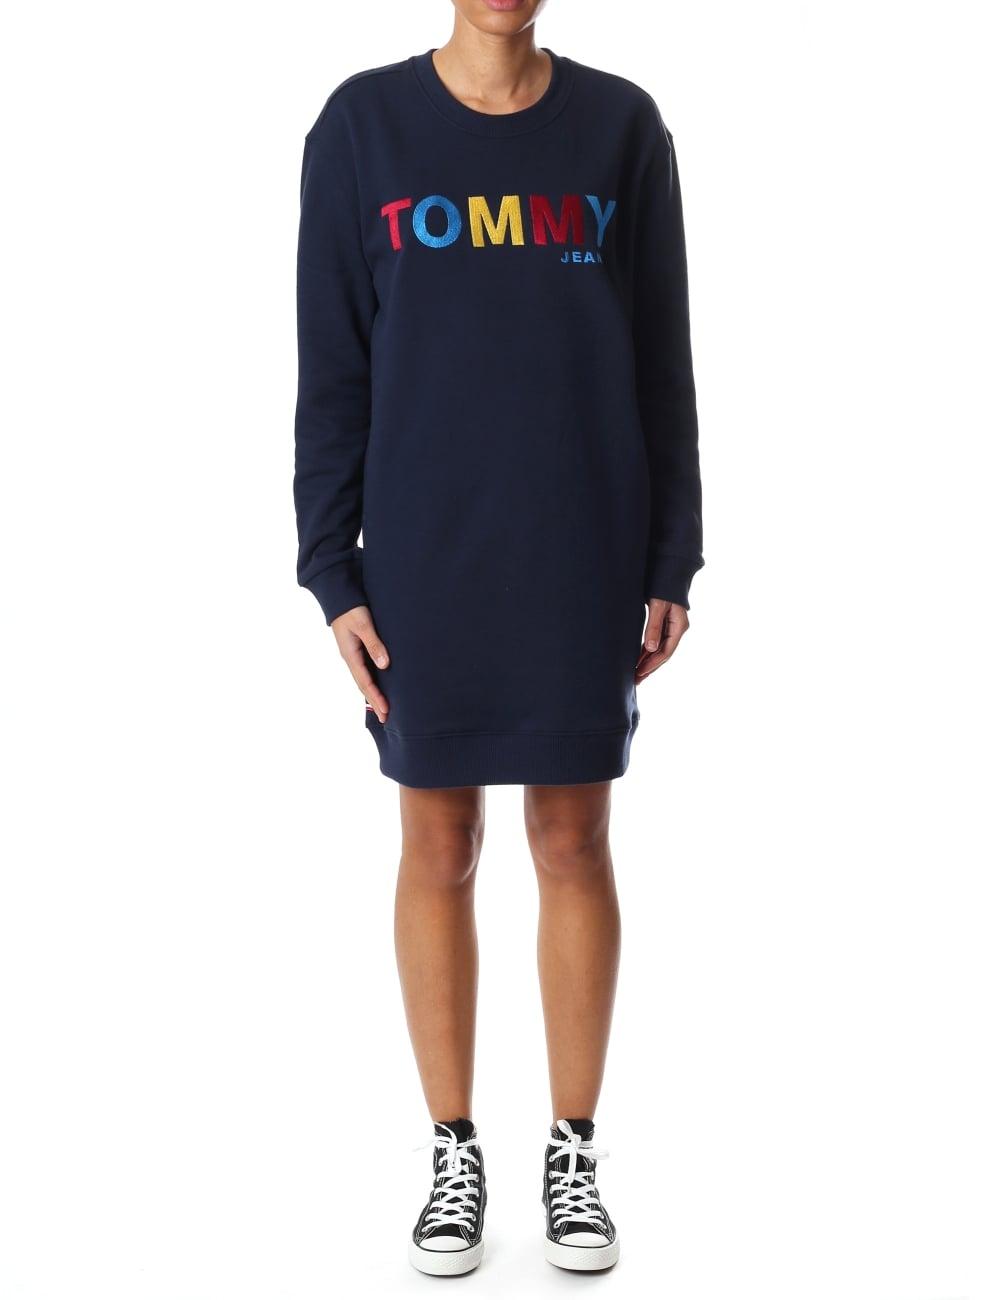 8062ae55141 Tommy Hilfiger Multi Coloured Women s Logo Sweat Dress